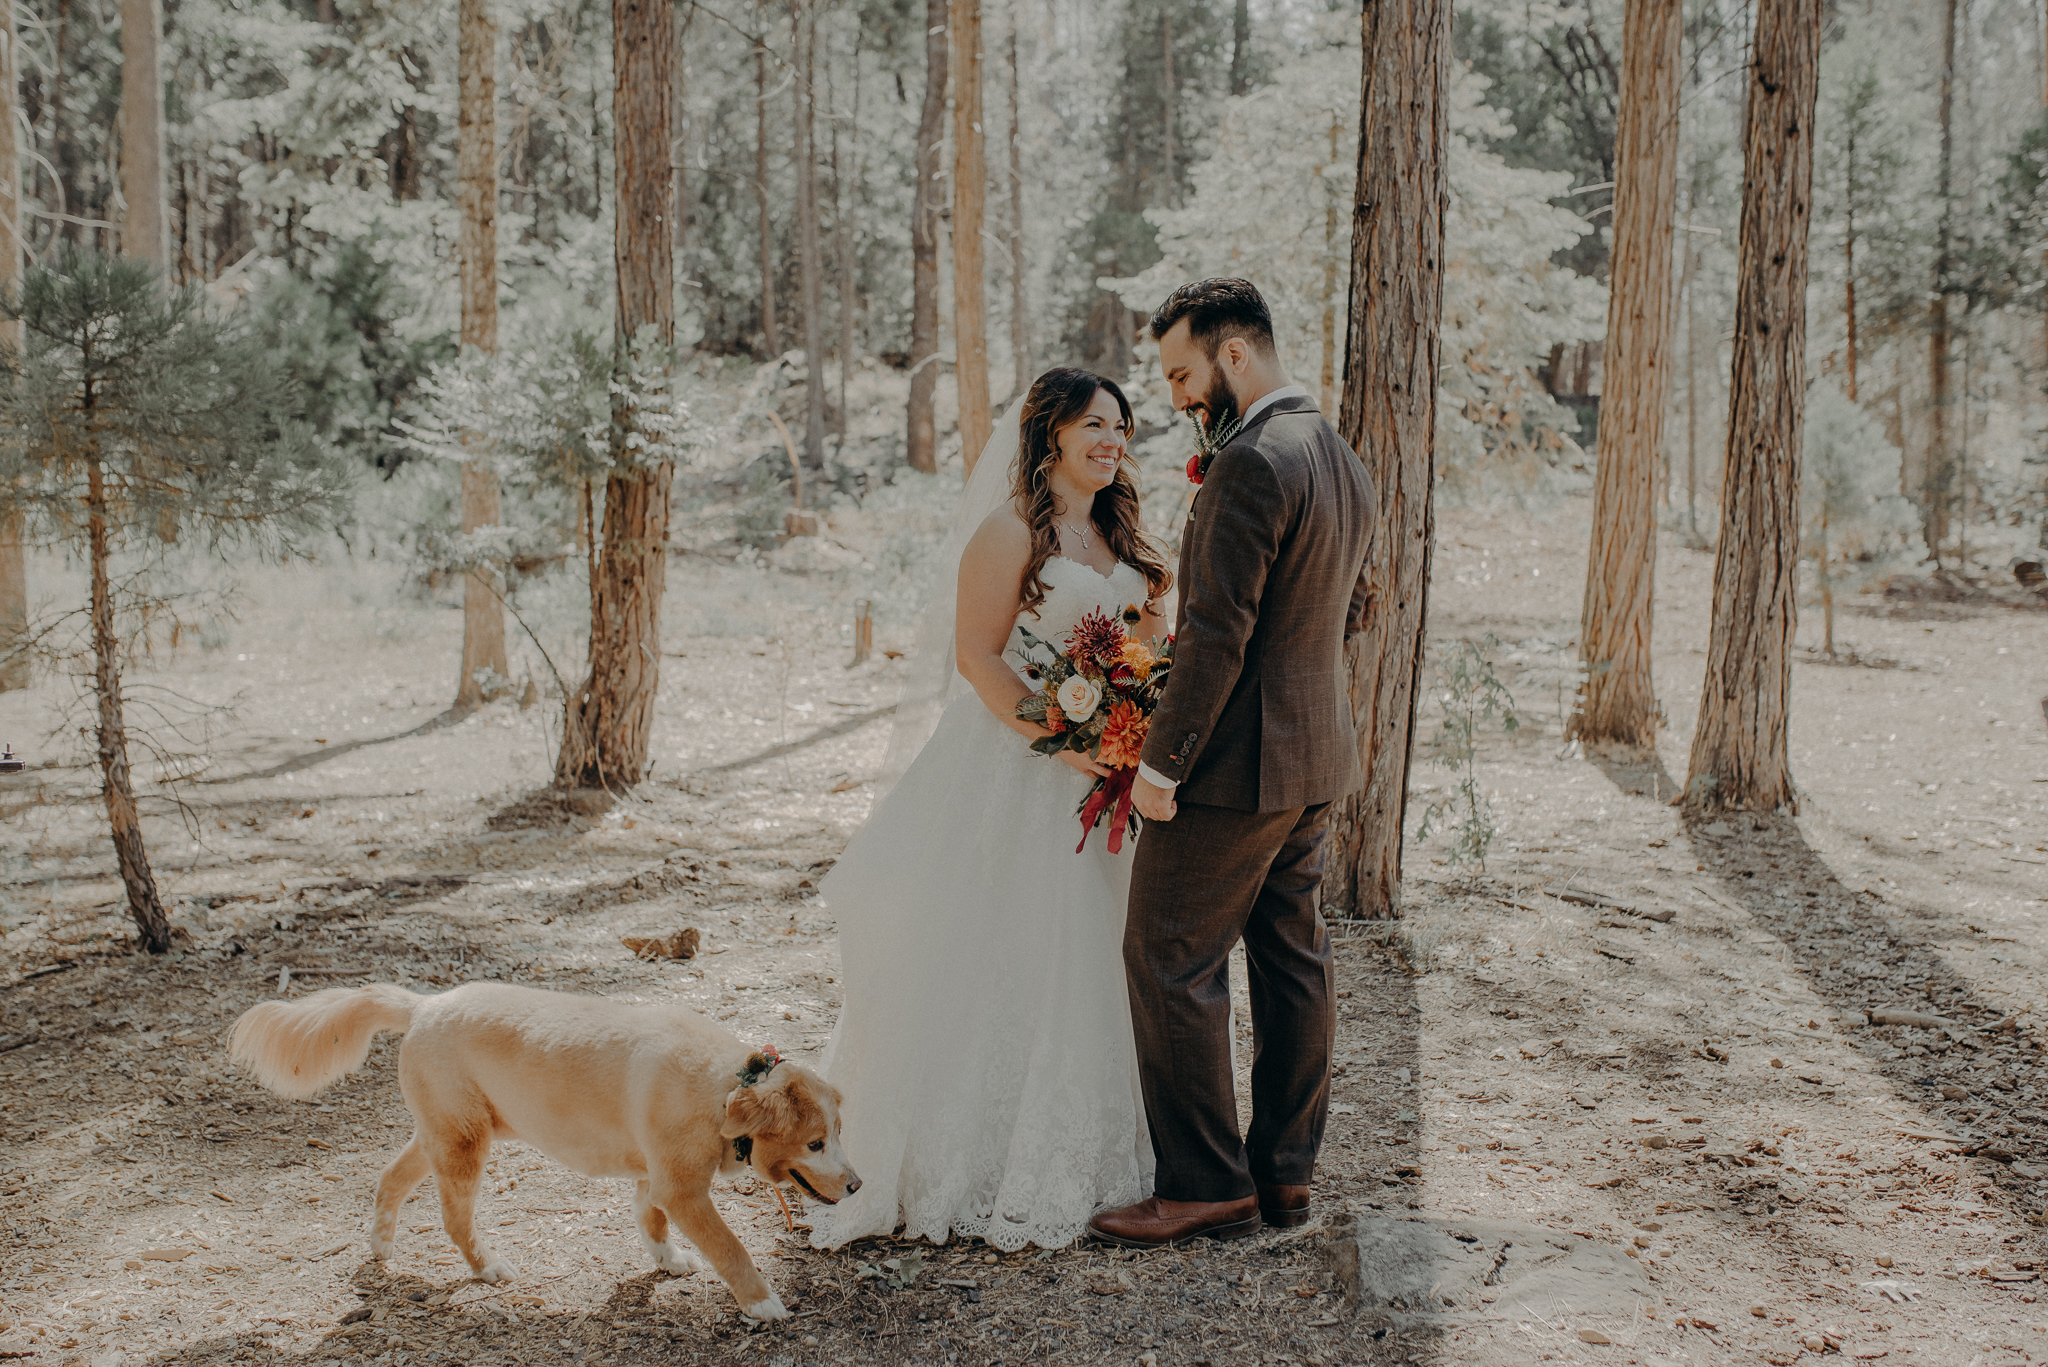 Yosemite Elopement Photographer - Evergreen Lodge Wedding Photographer - IsaiahAndTaylor.com-074.jpg